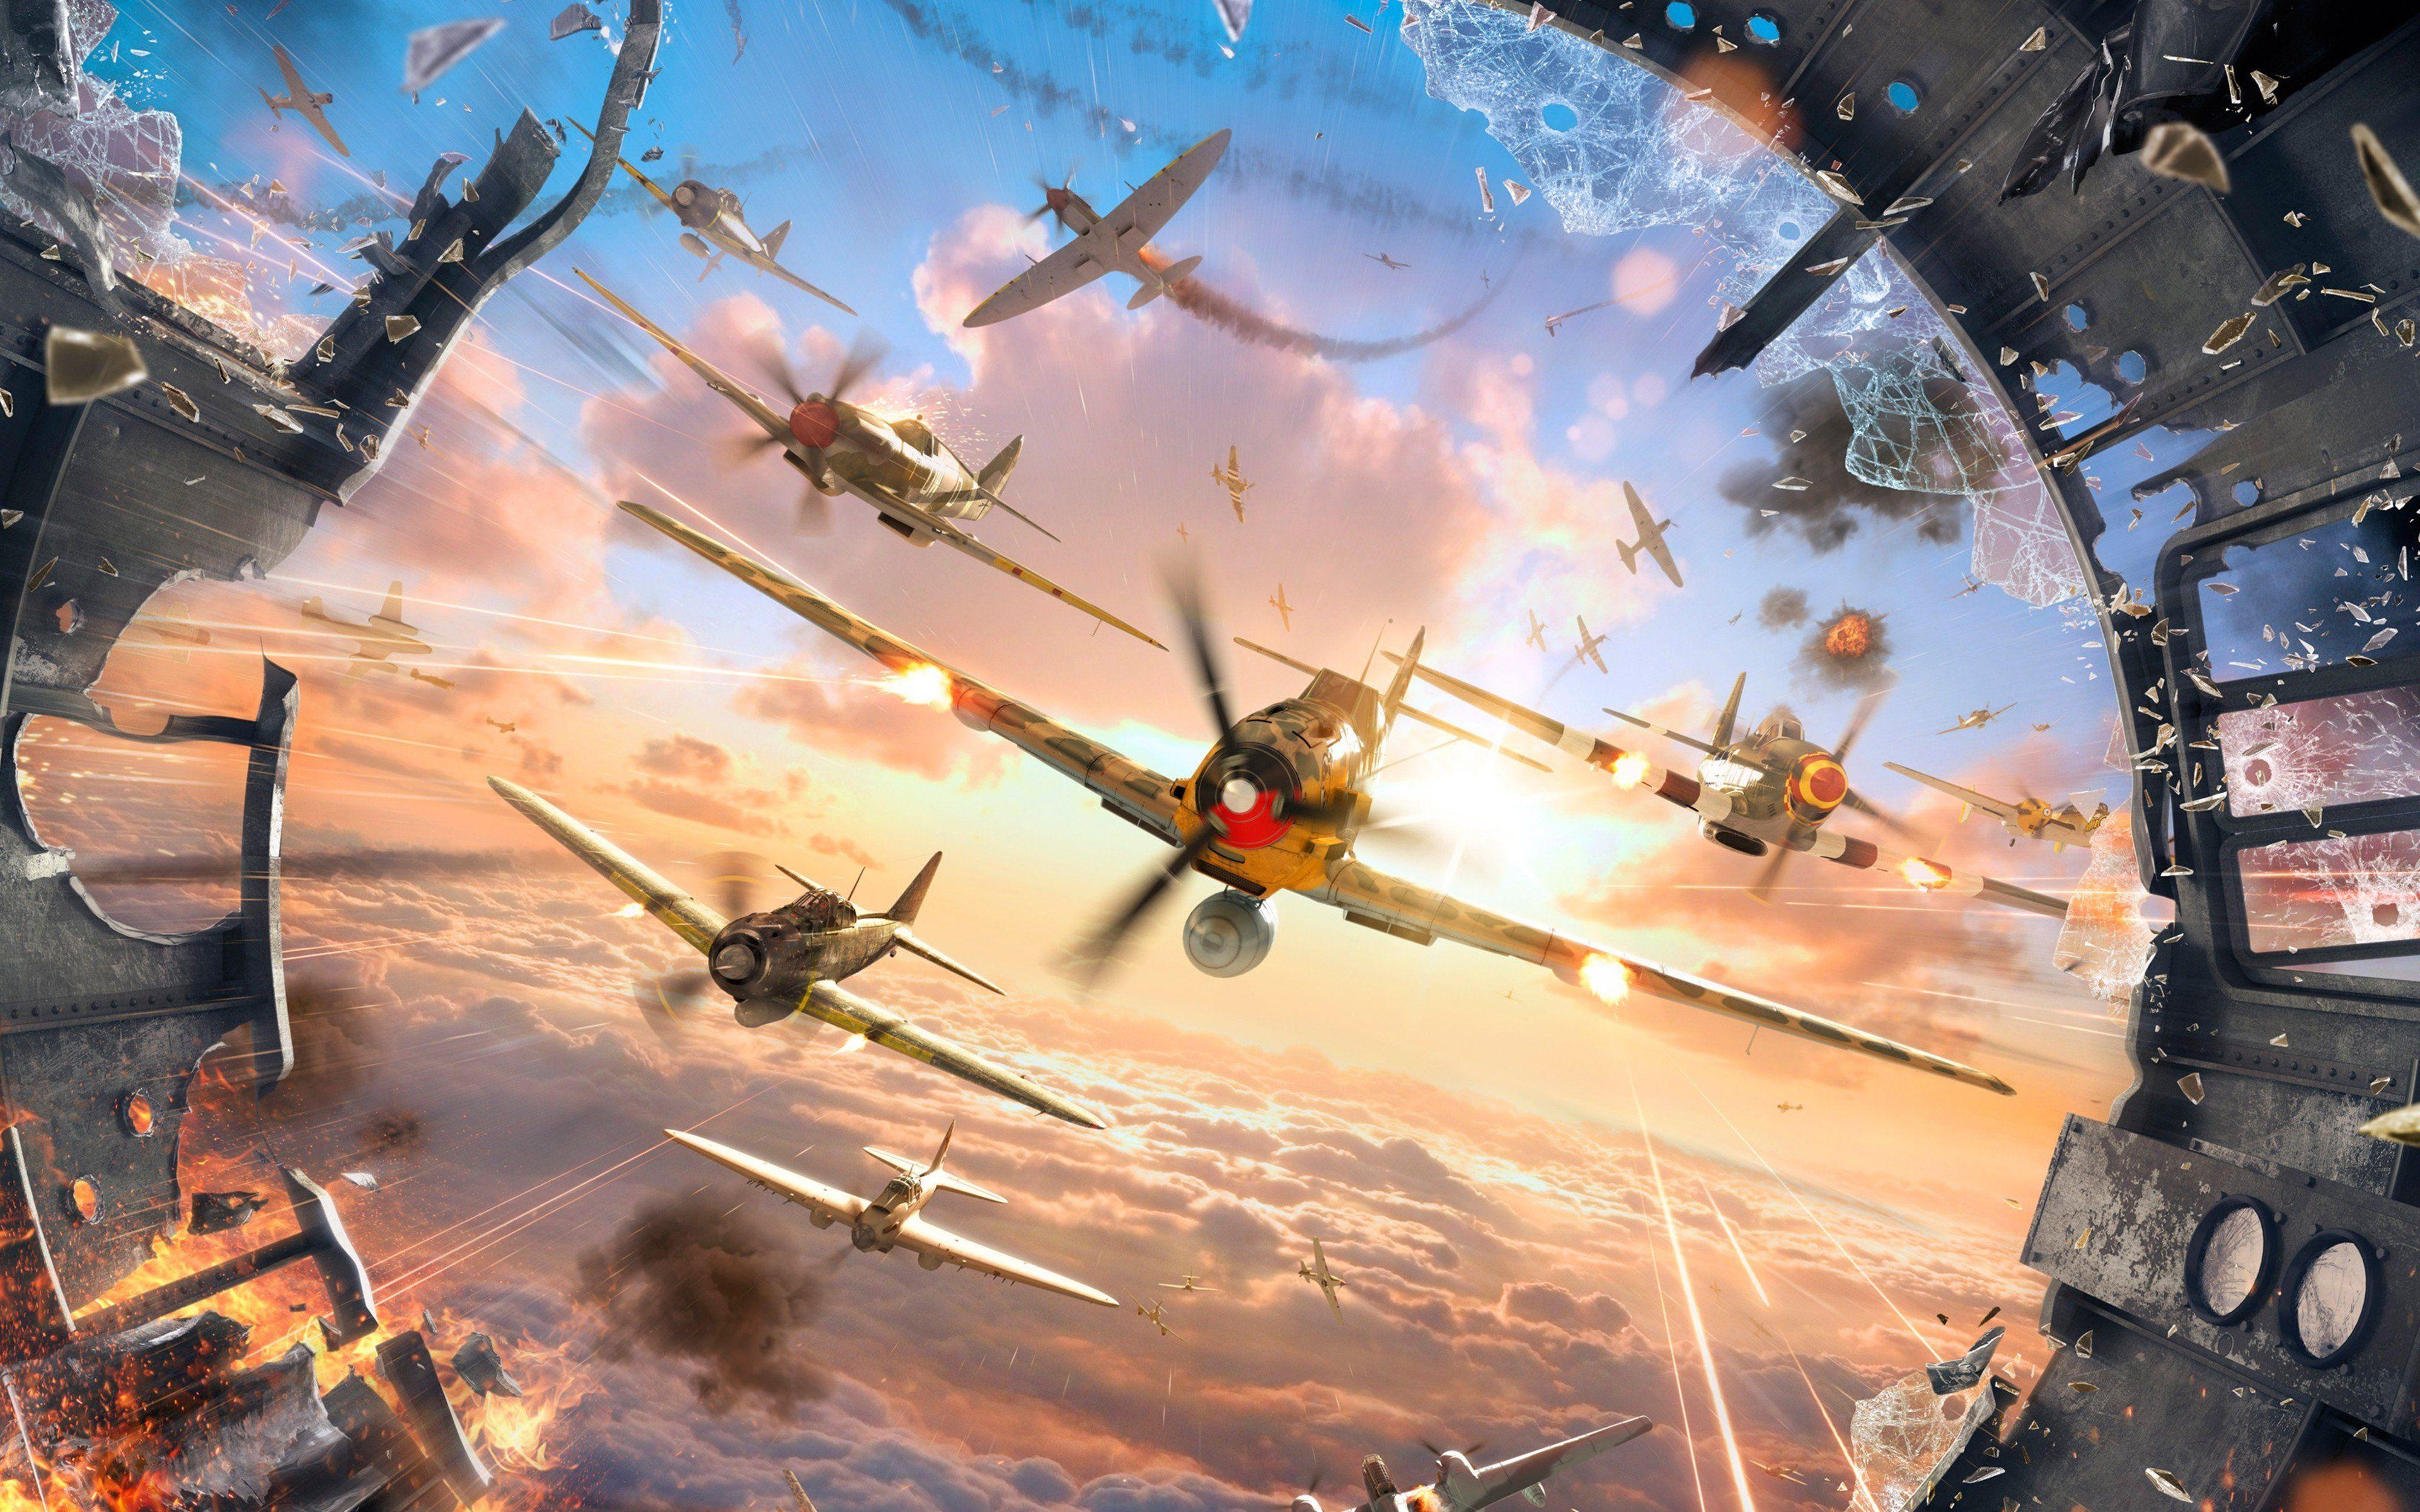 World Of Warplanes Game War Wwii 4000x2500 Wallpaper 4000x2500 346790 Wallpaperup Widescreen Wallpaper Wallpaper Images Hd 3d Wallpaper For Pc